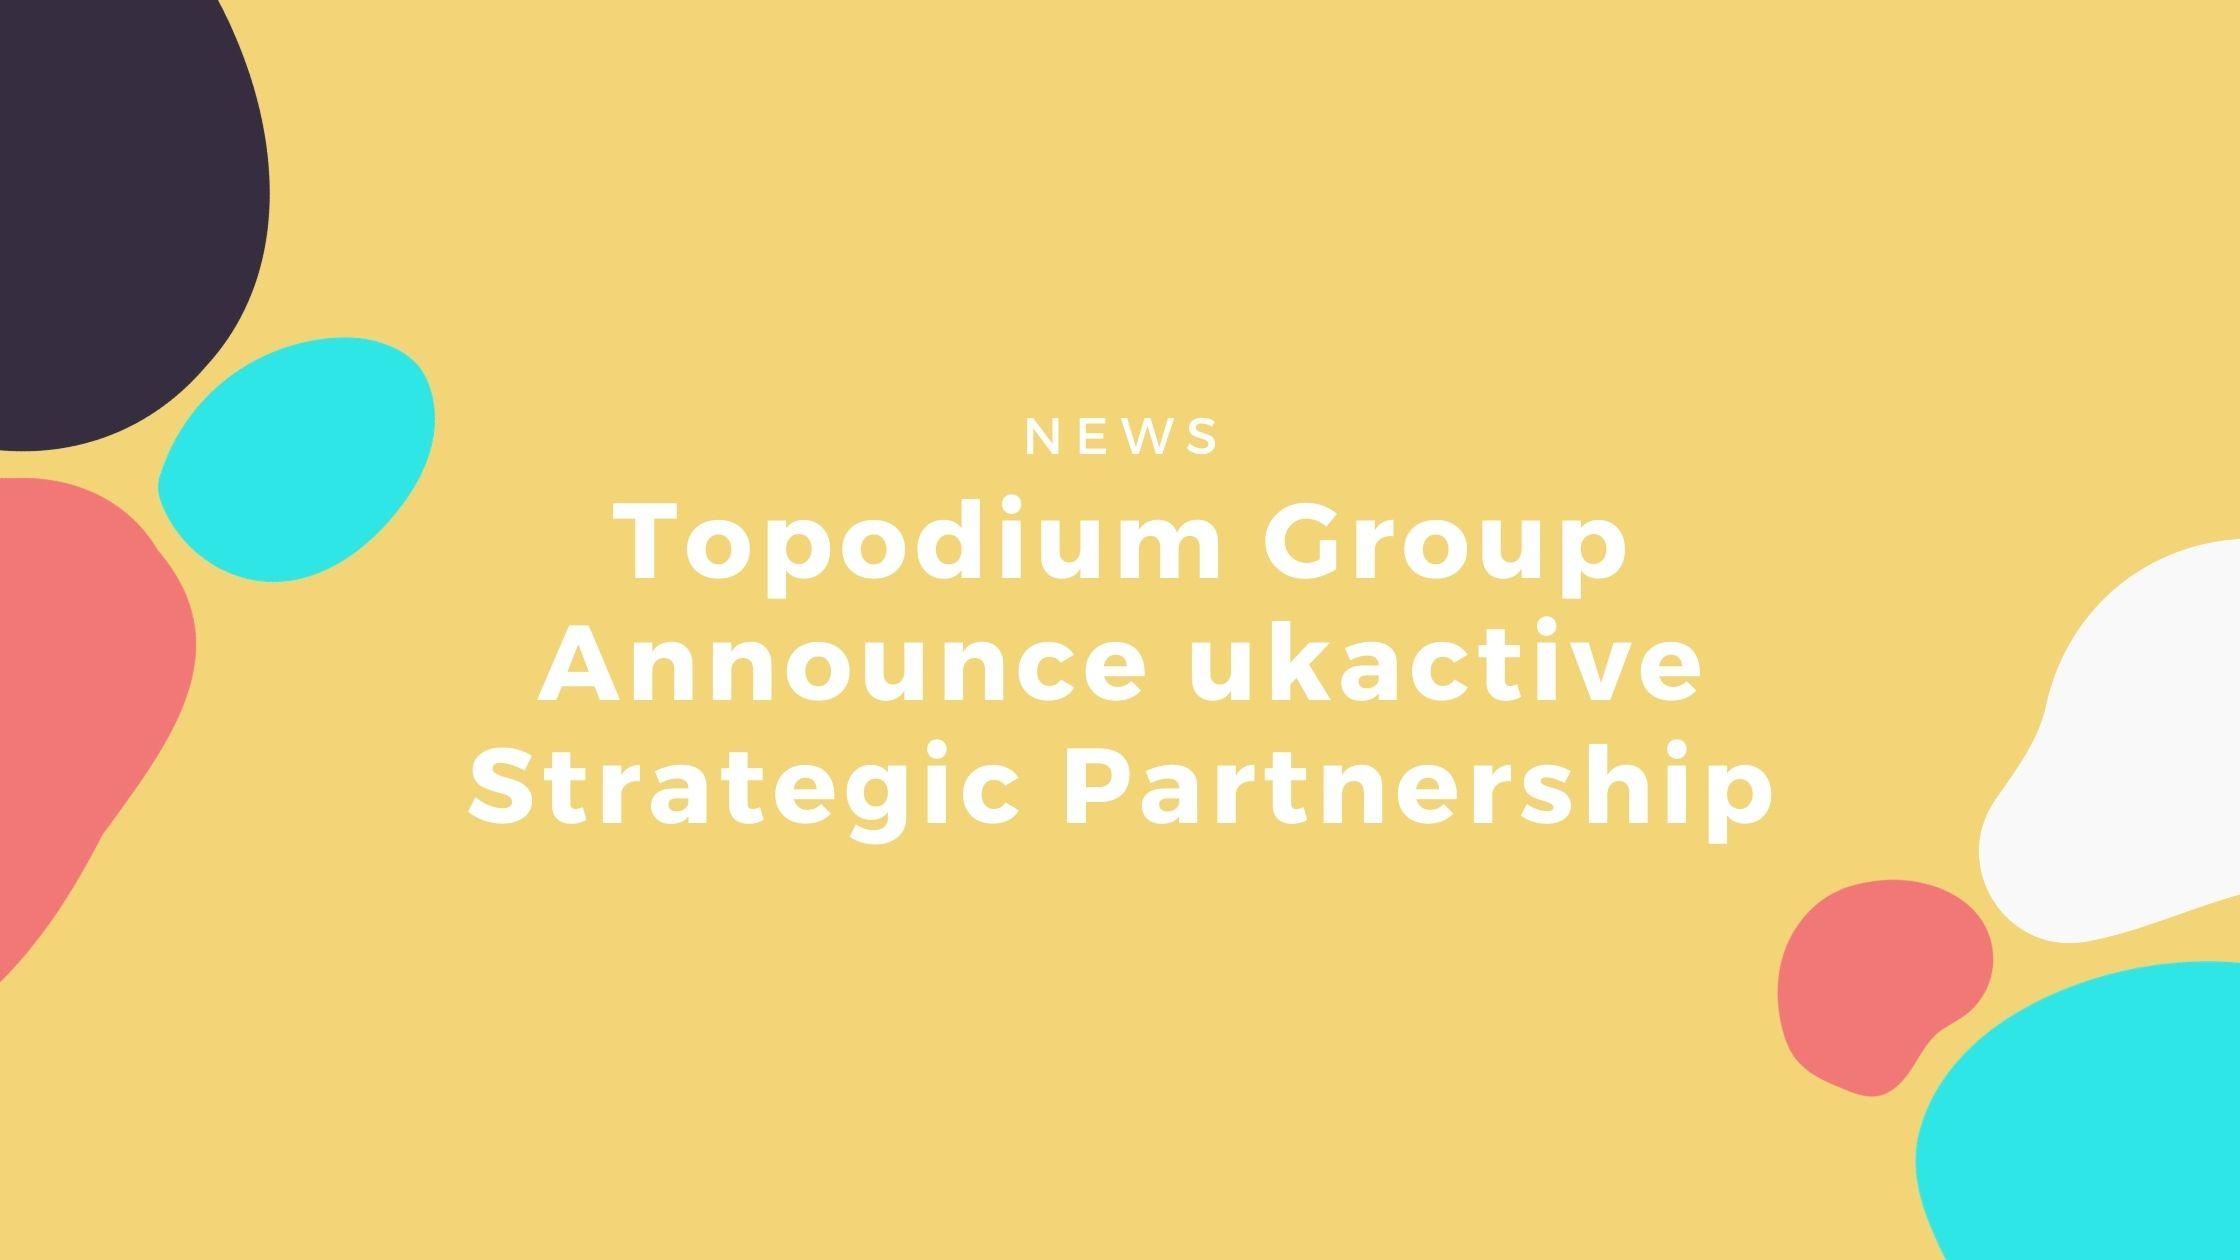 ukactive topodium group partnership